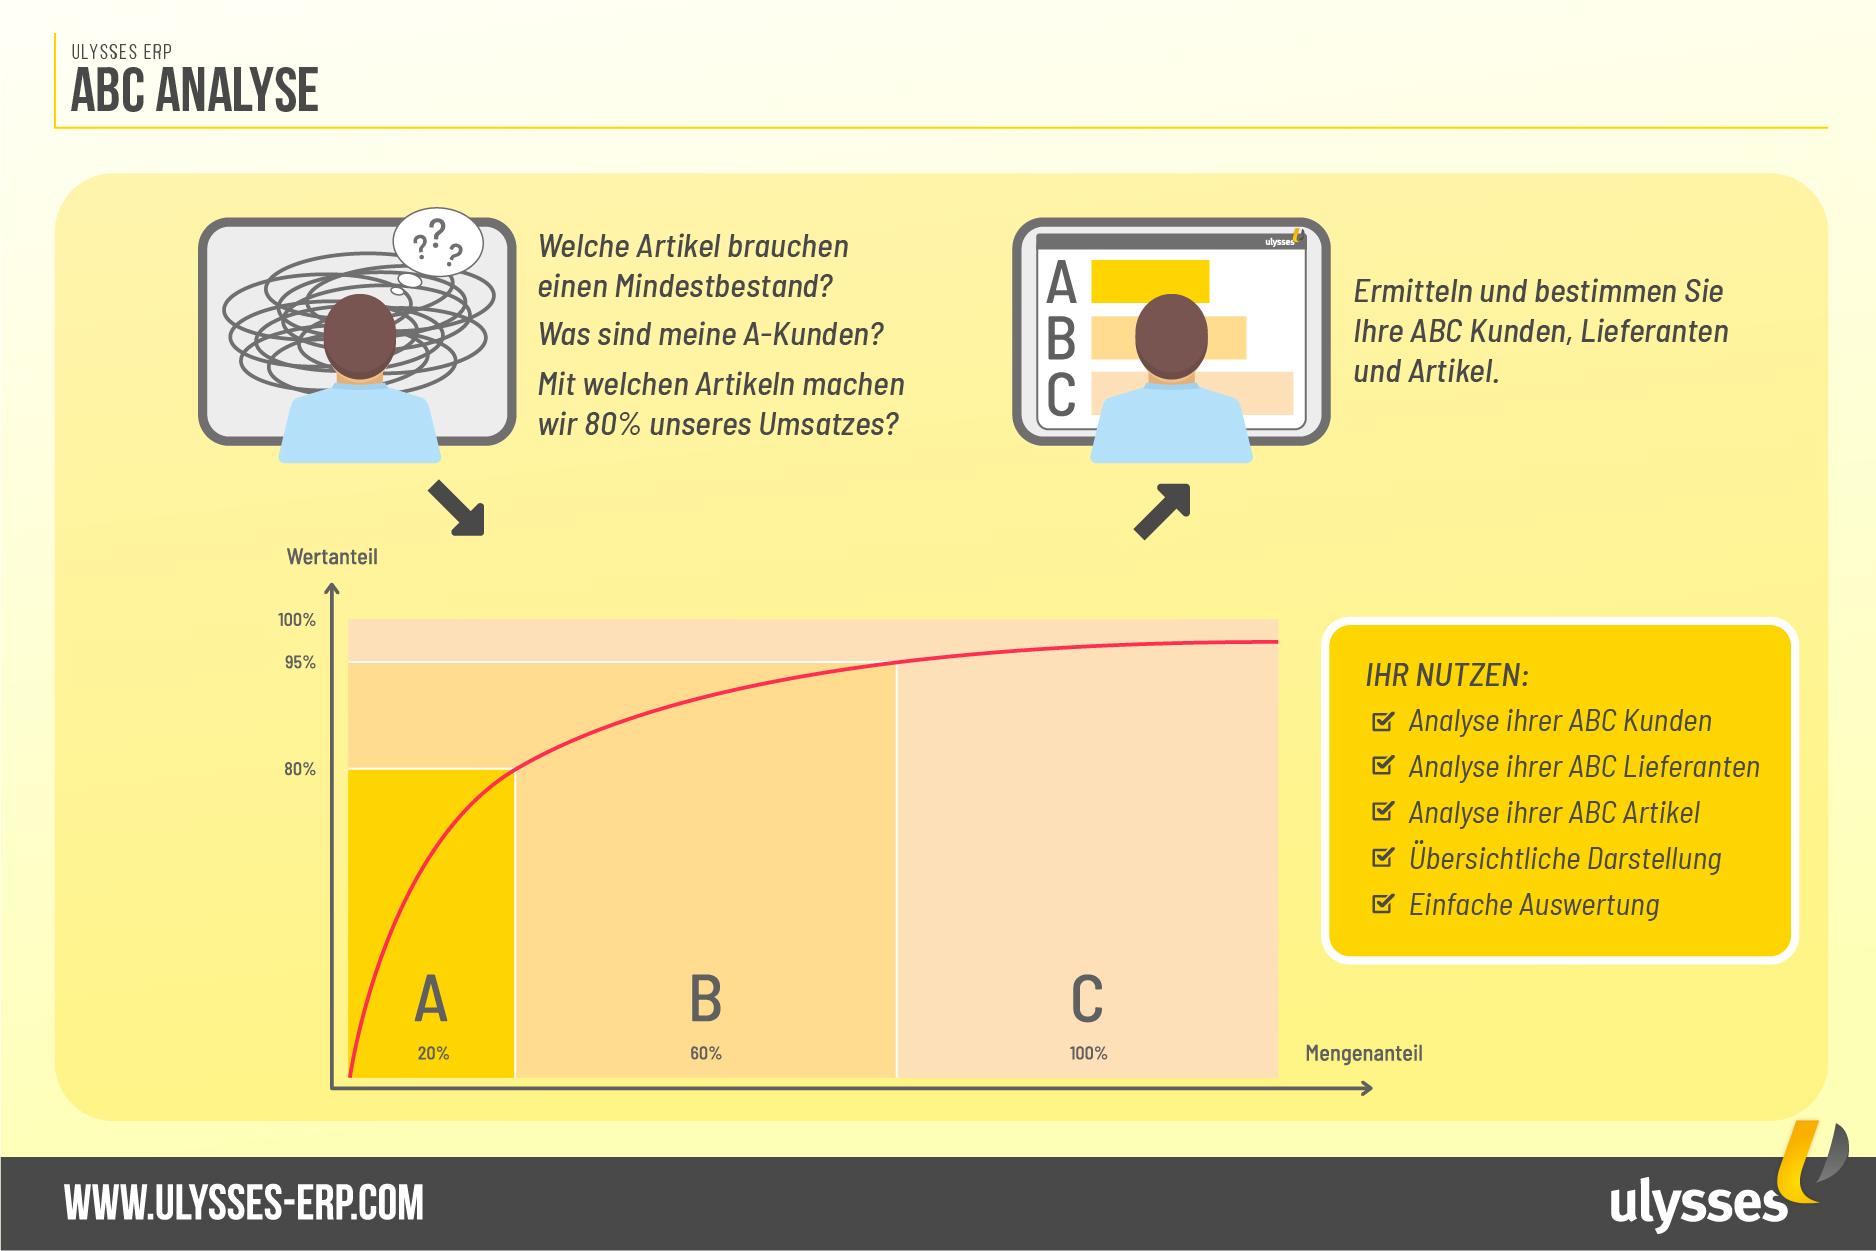 ABC Analyse nach dem Paretoprinzip